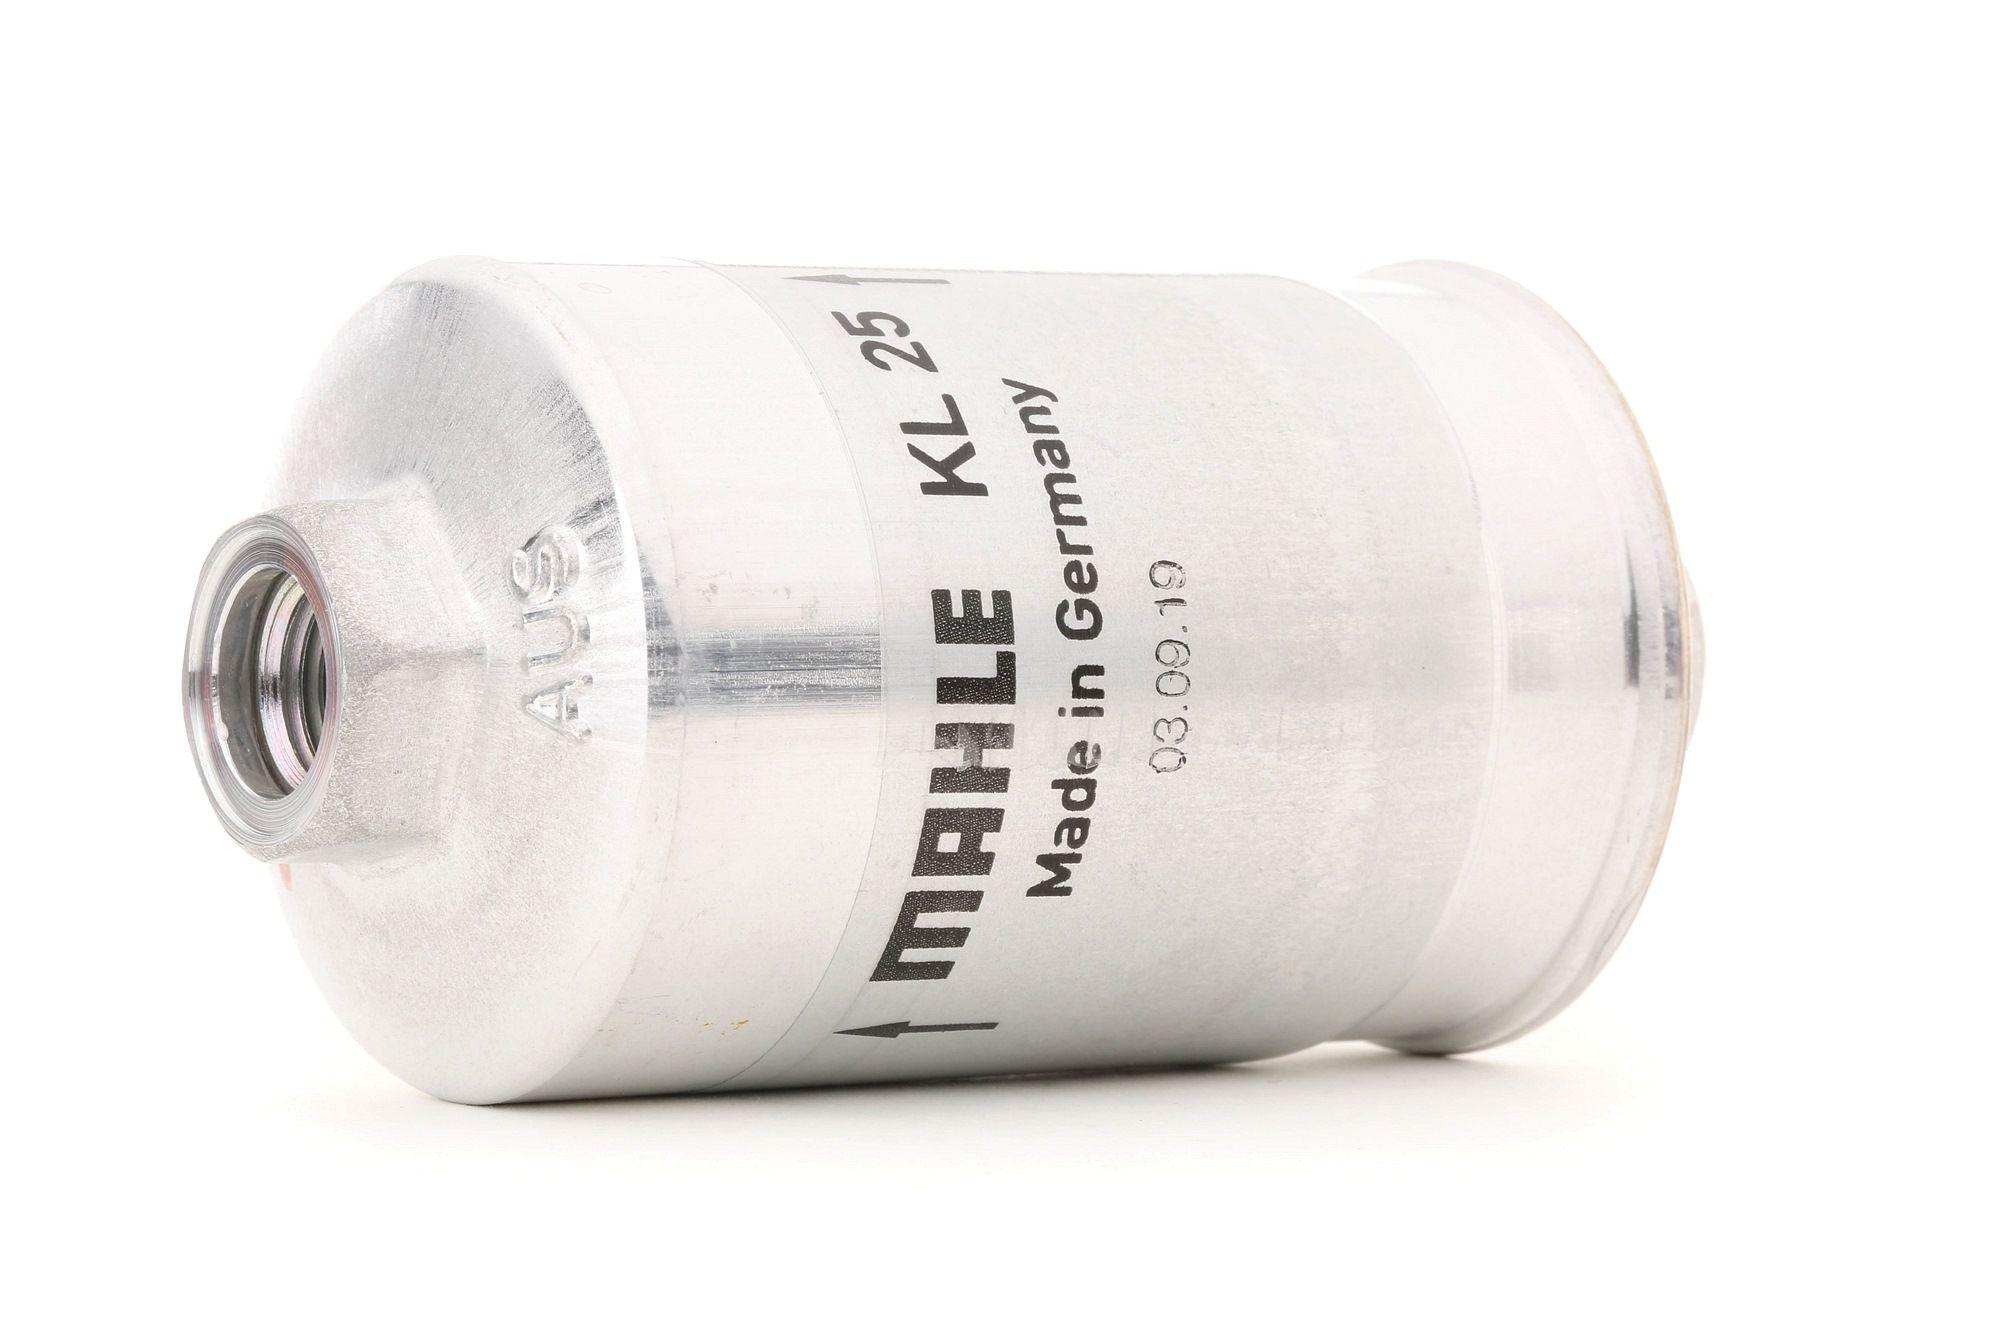 MAHLE ORIGINAL: Original Dieselfilter KL 25 (Gehäusedurchmesser: 55mm)